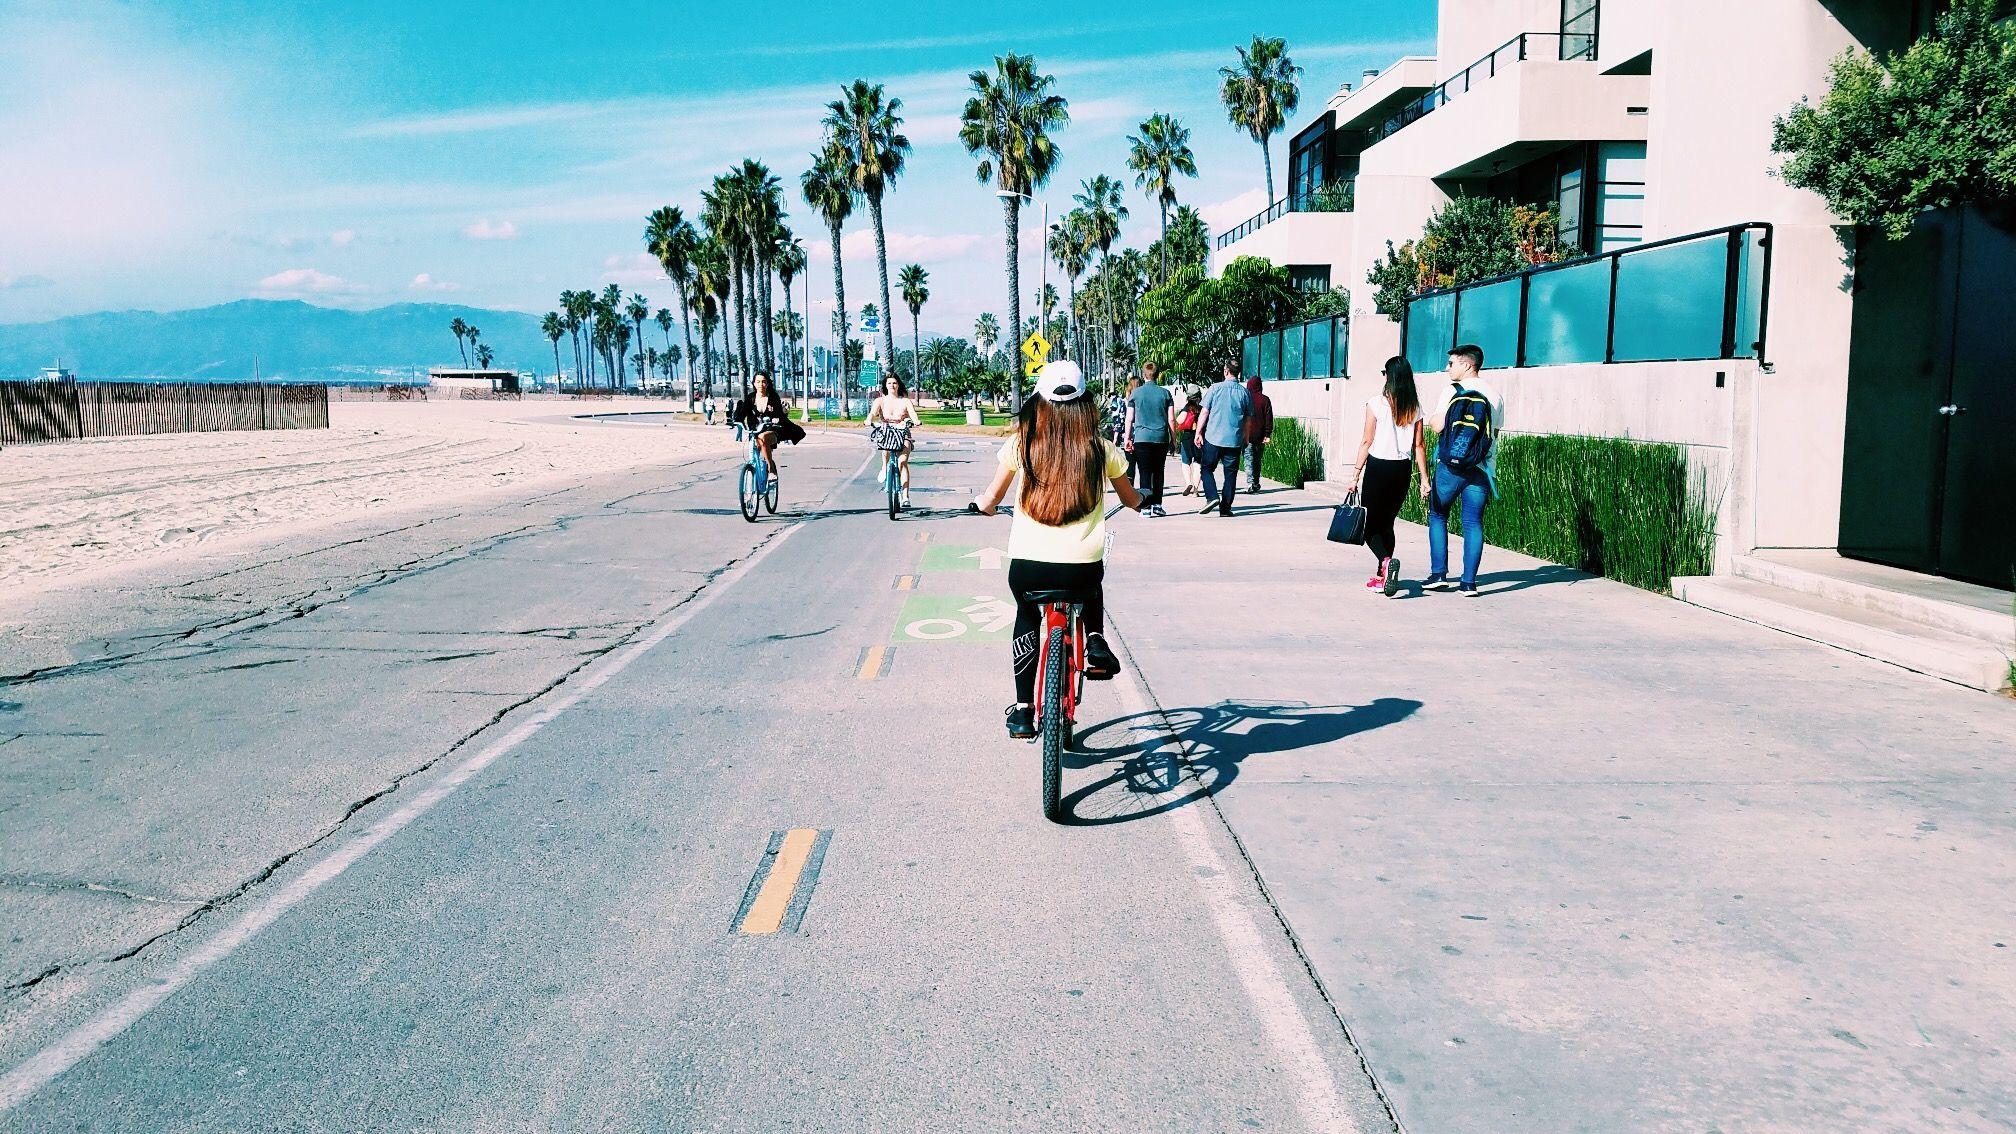 Bike riding in venice beach venice beach tumblr